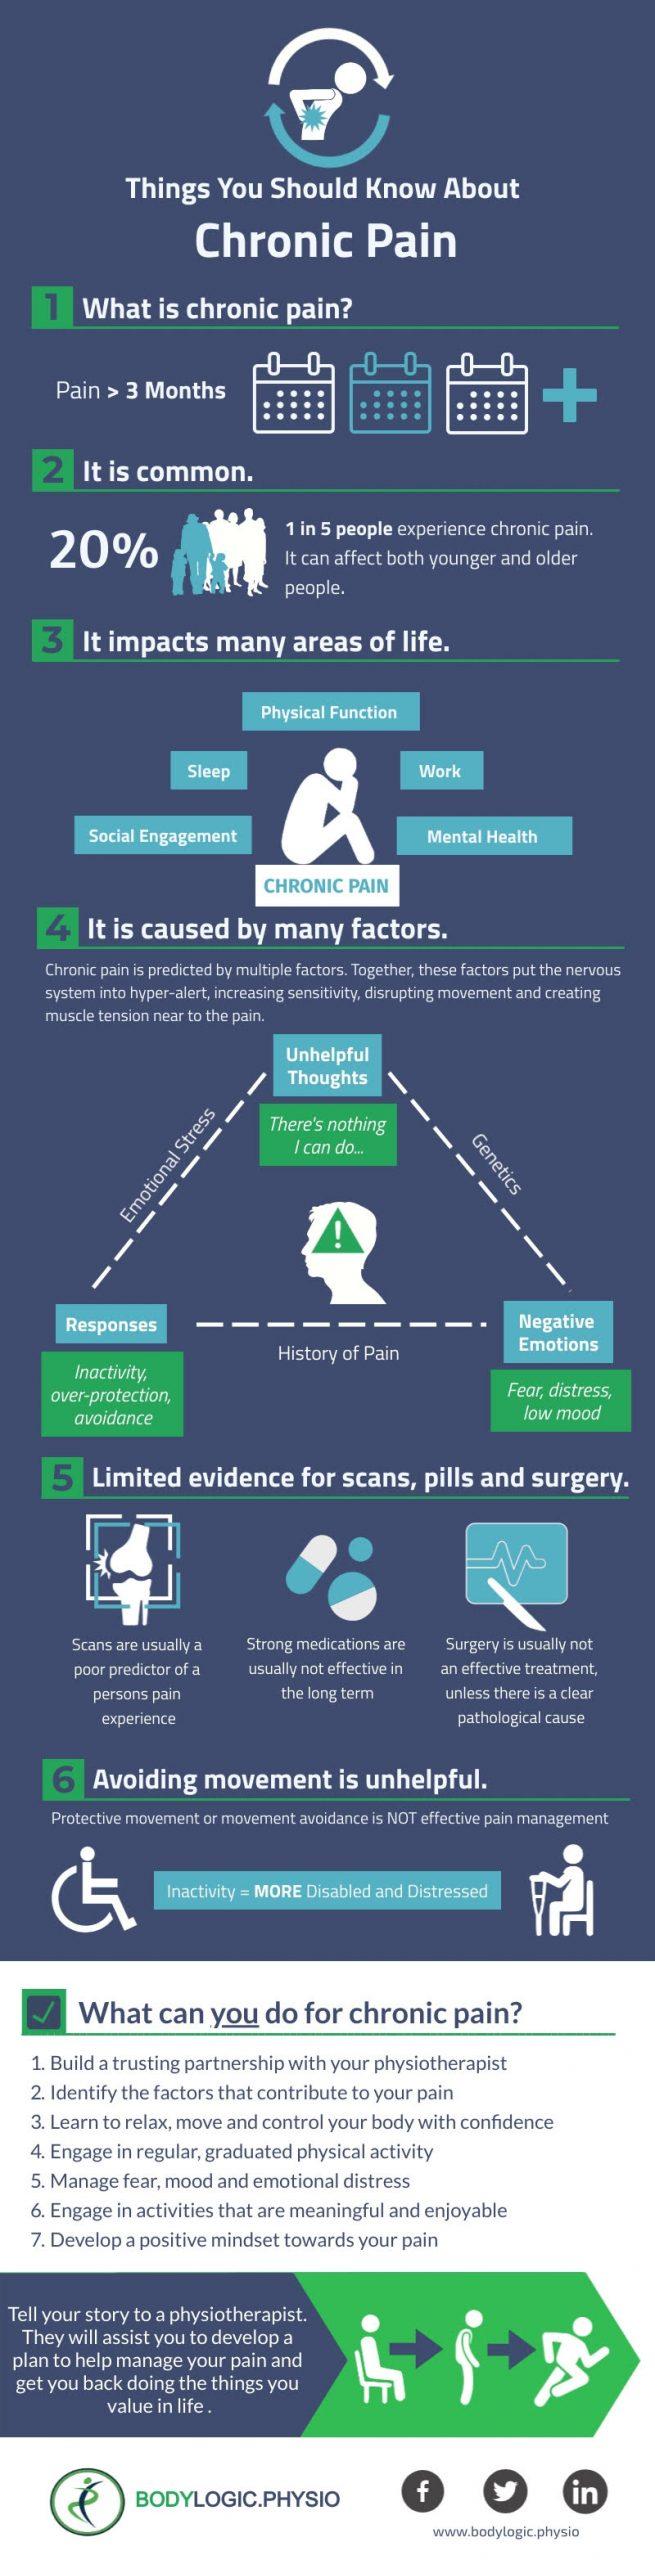 Chronic pain infographic